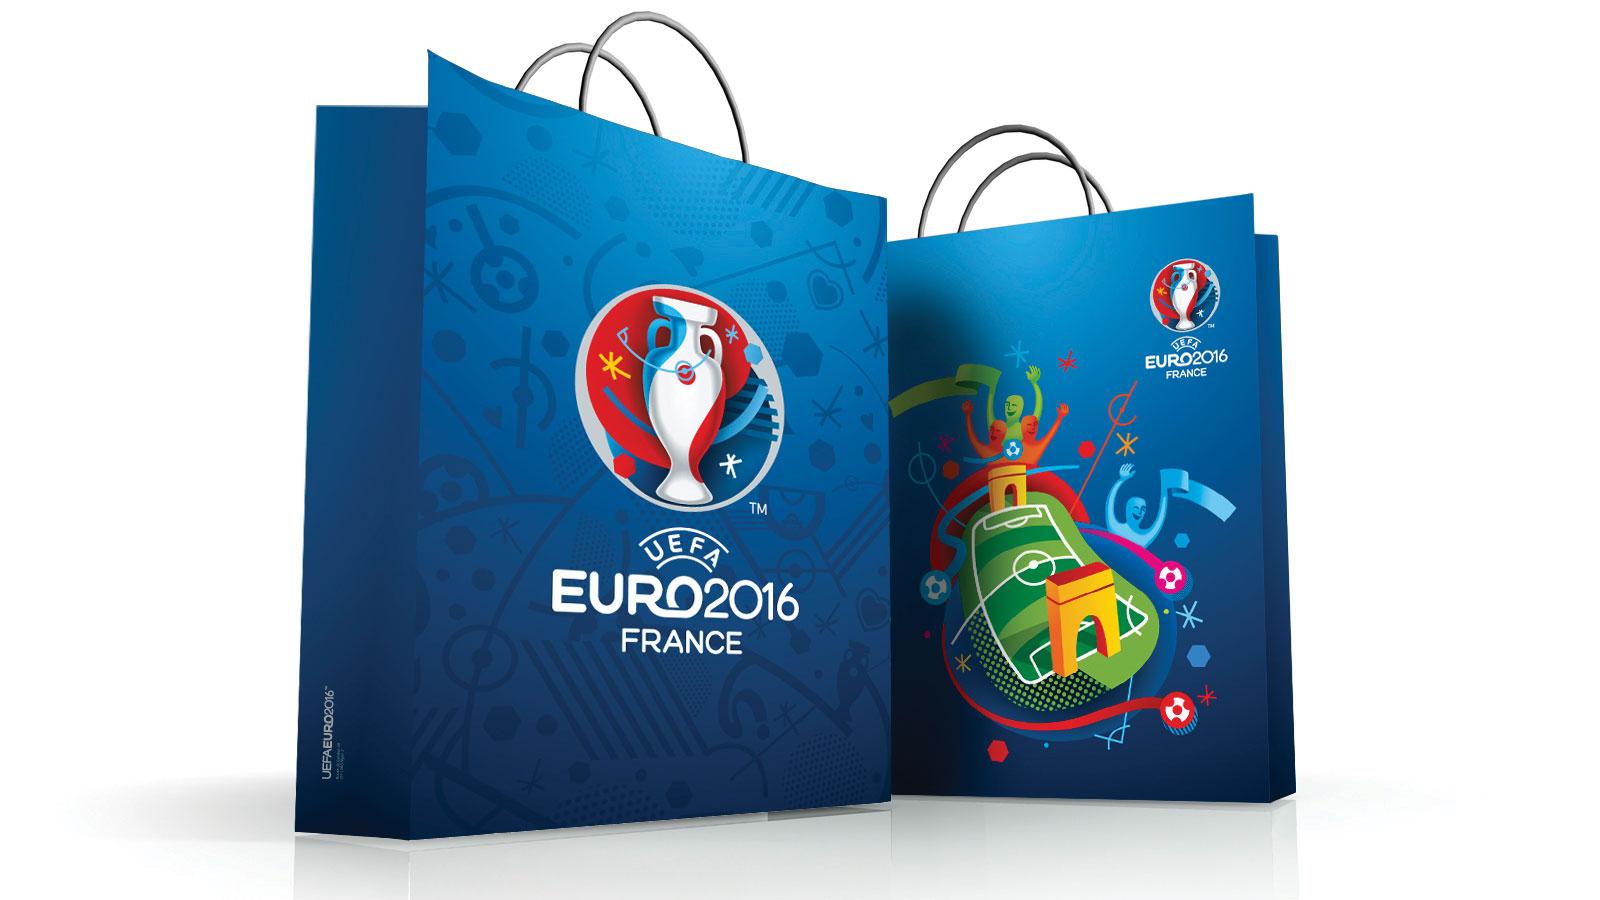 Euro 2016 branding